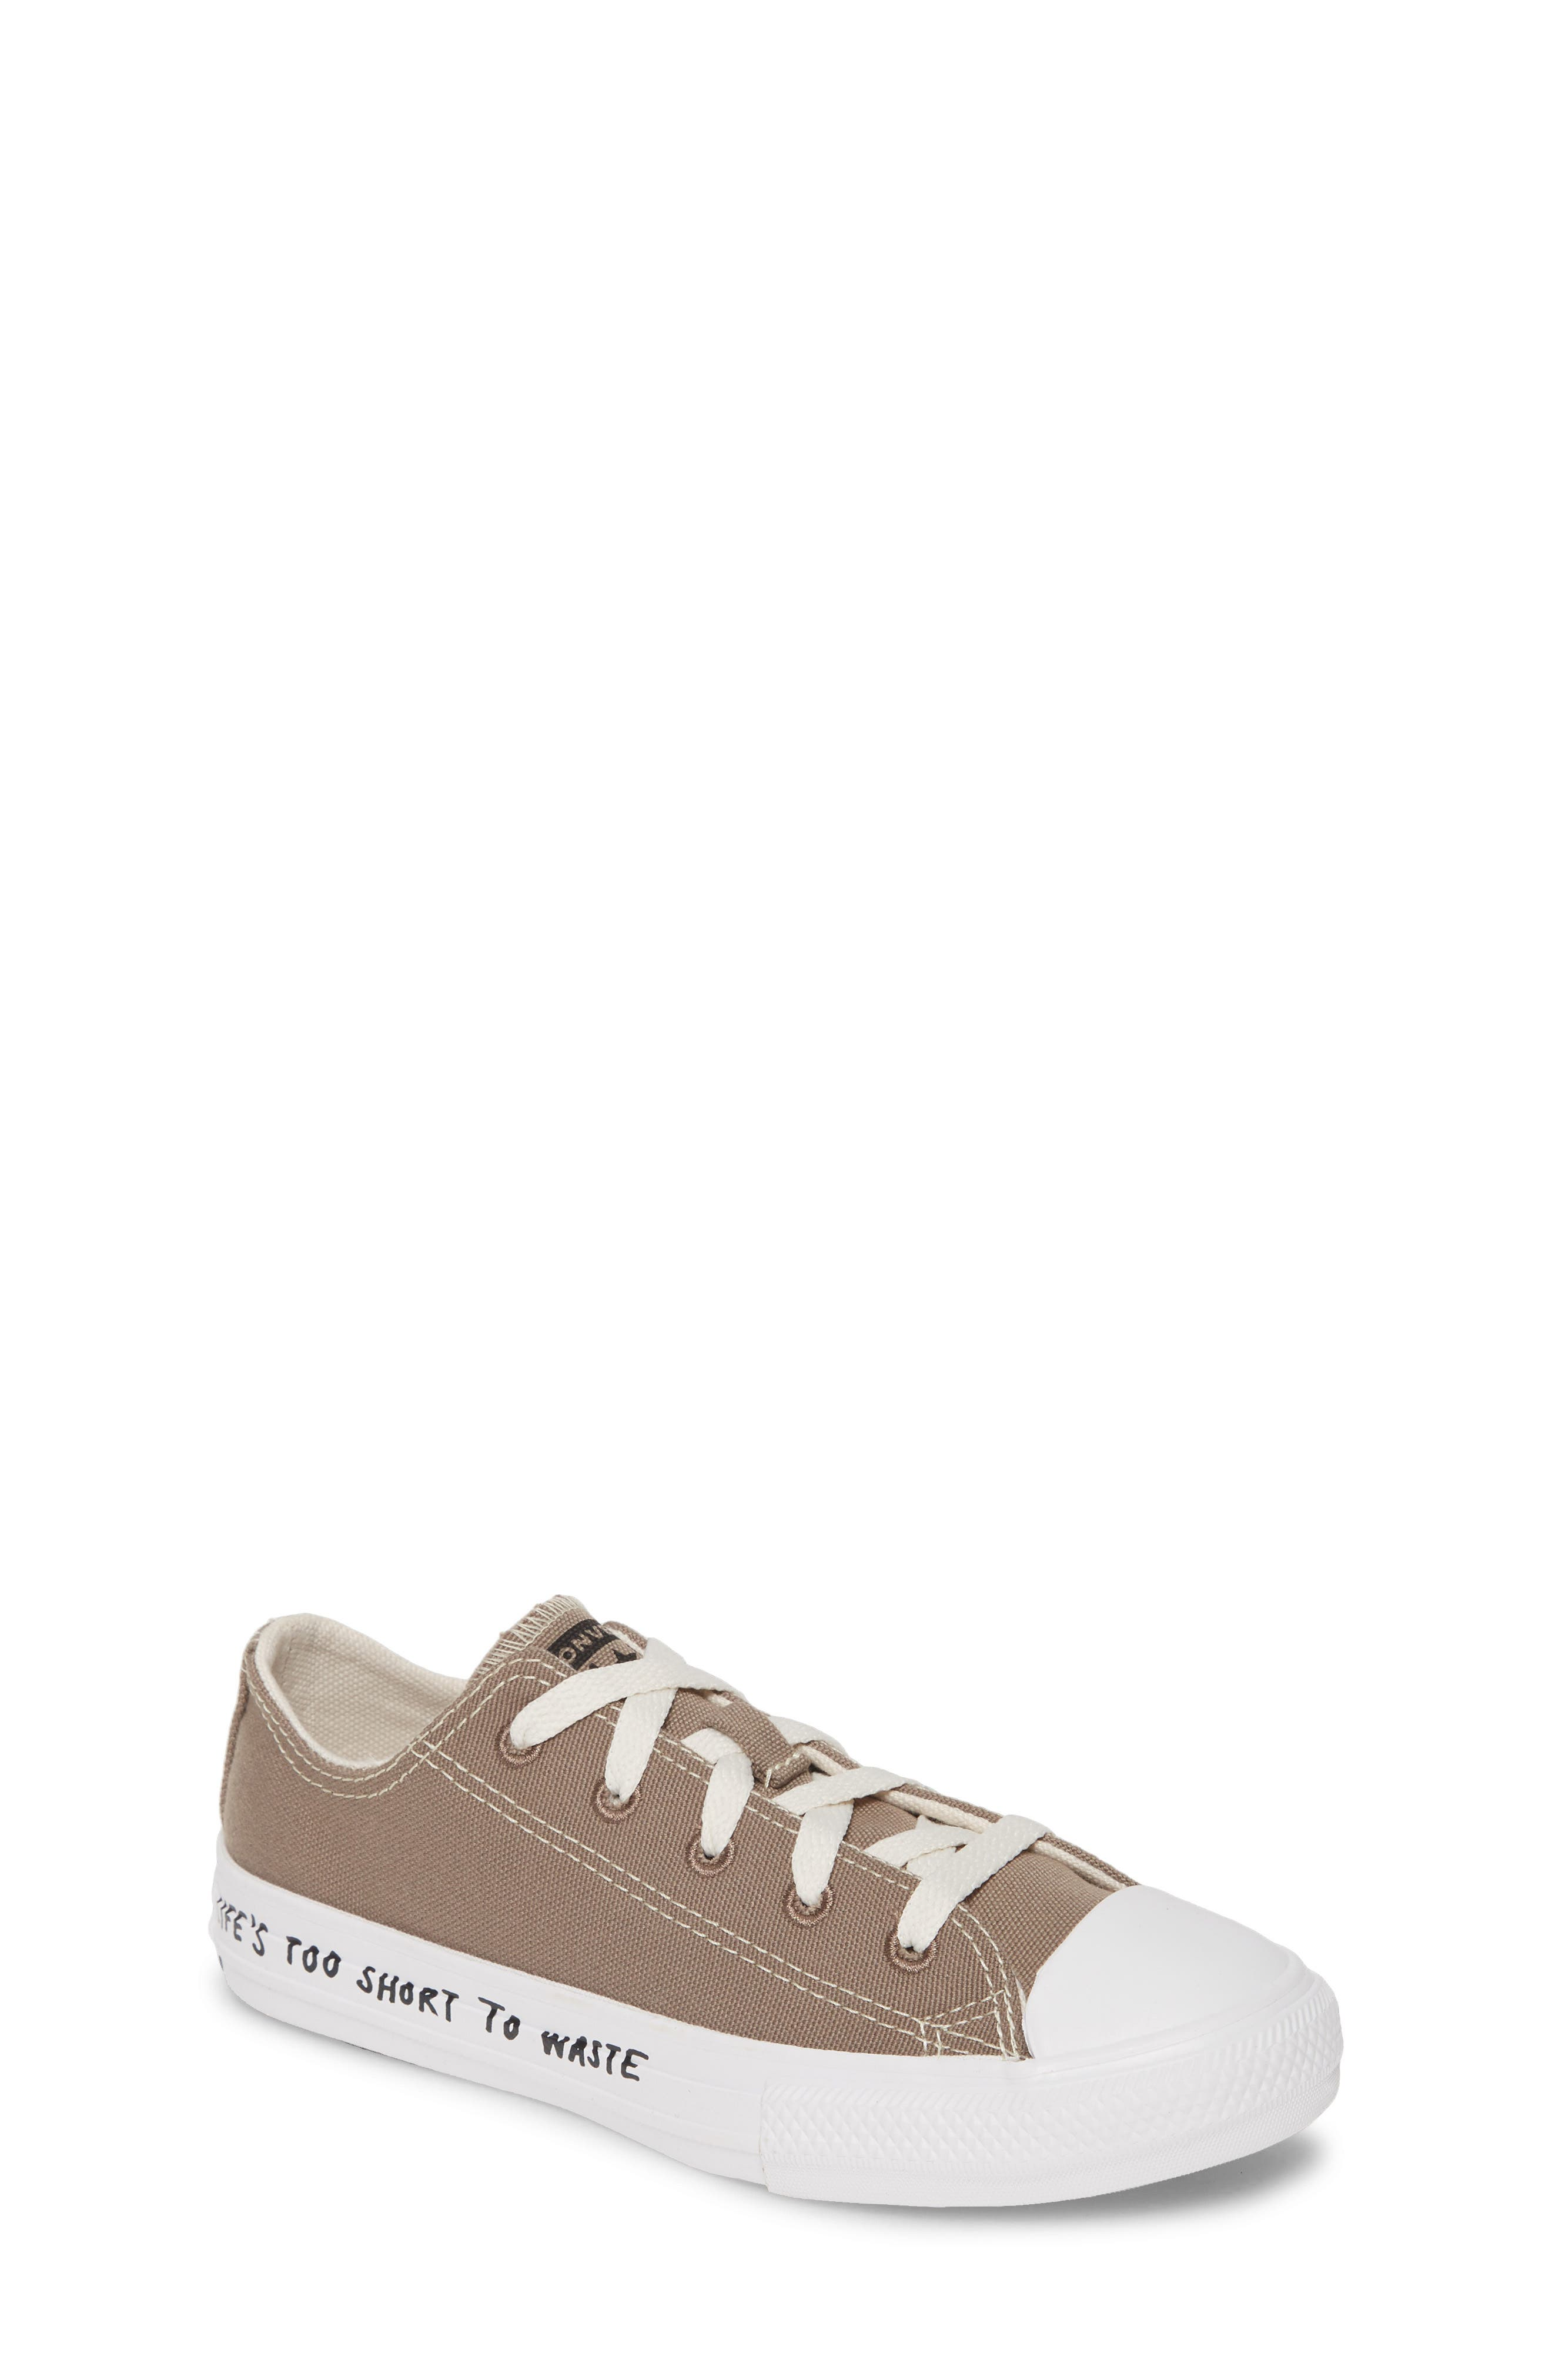 Converse Chuck Taylor All Star Renew Sneaker